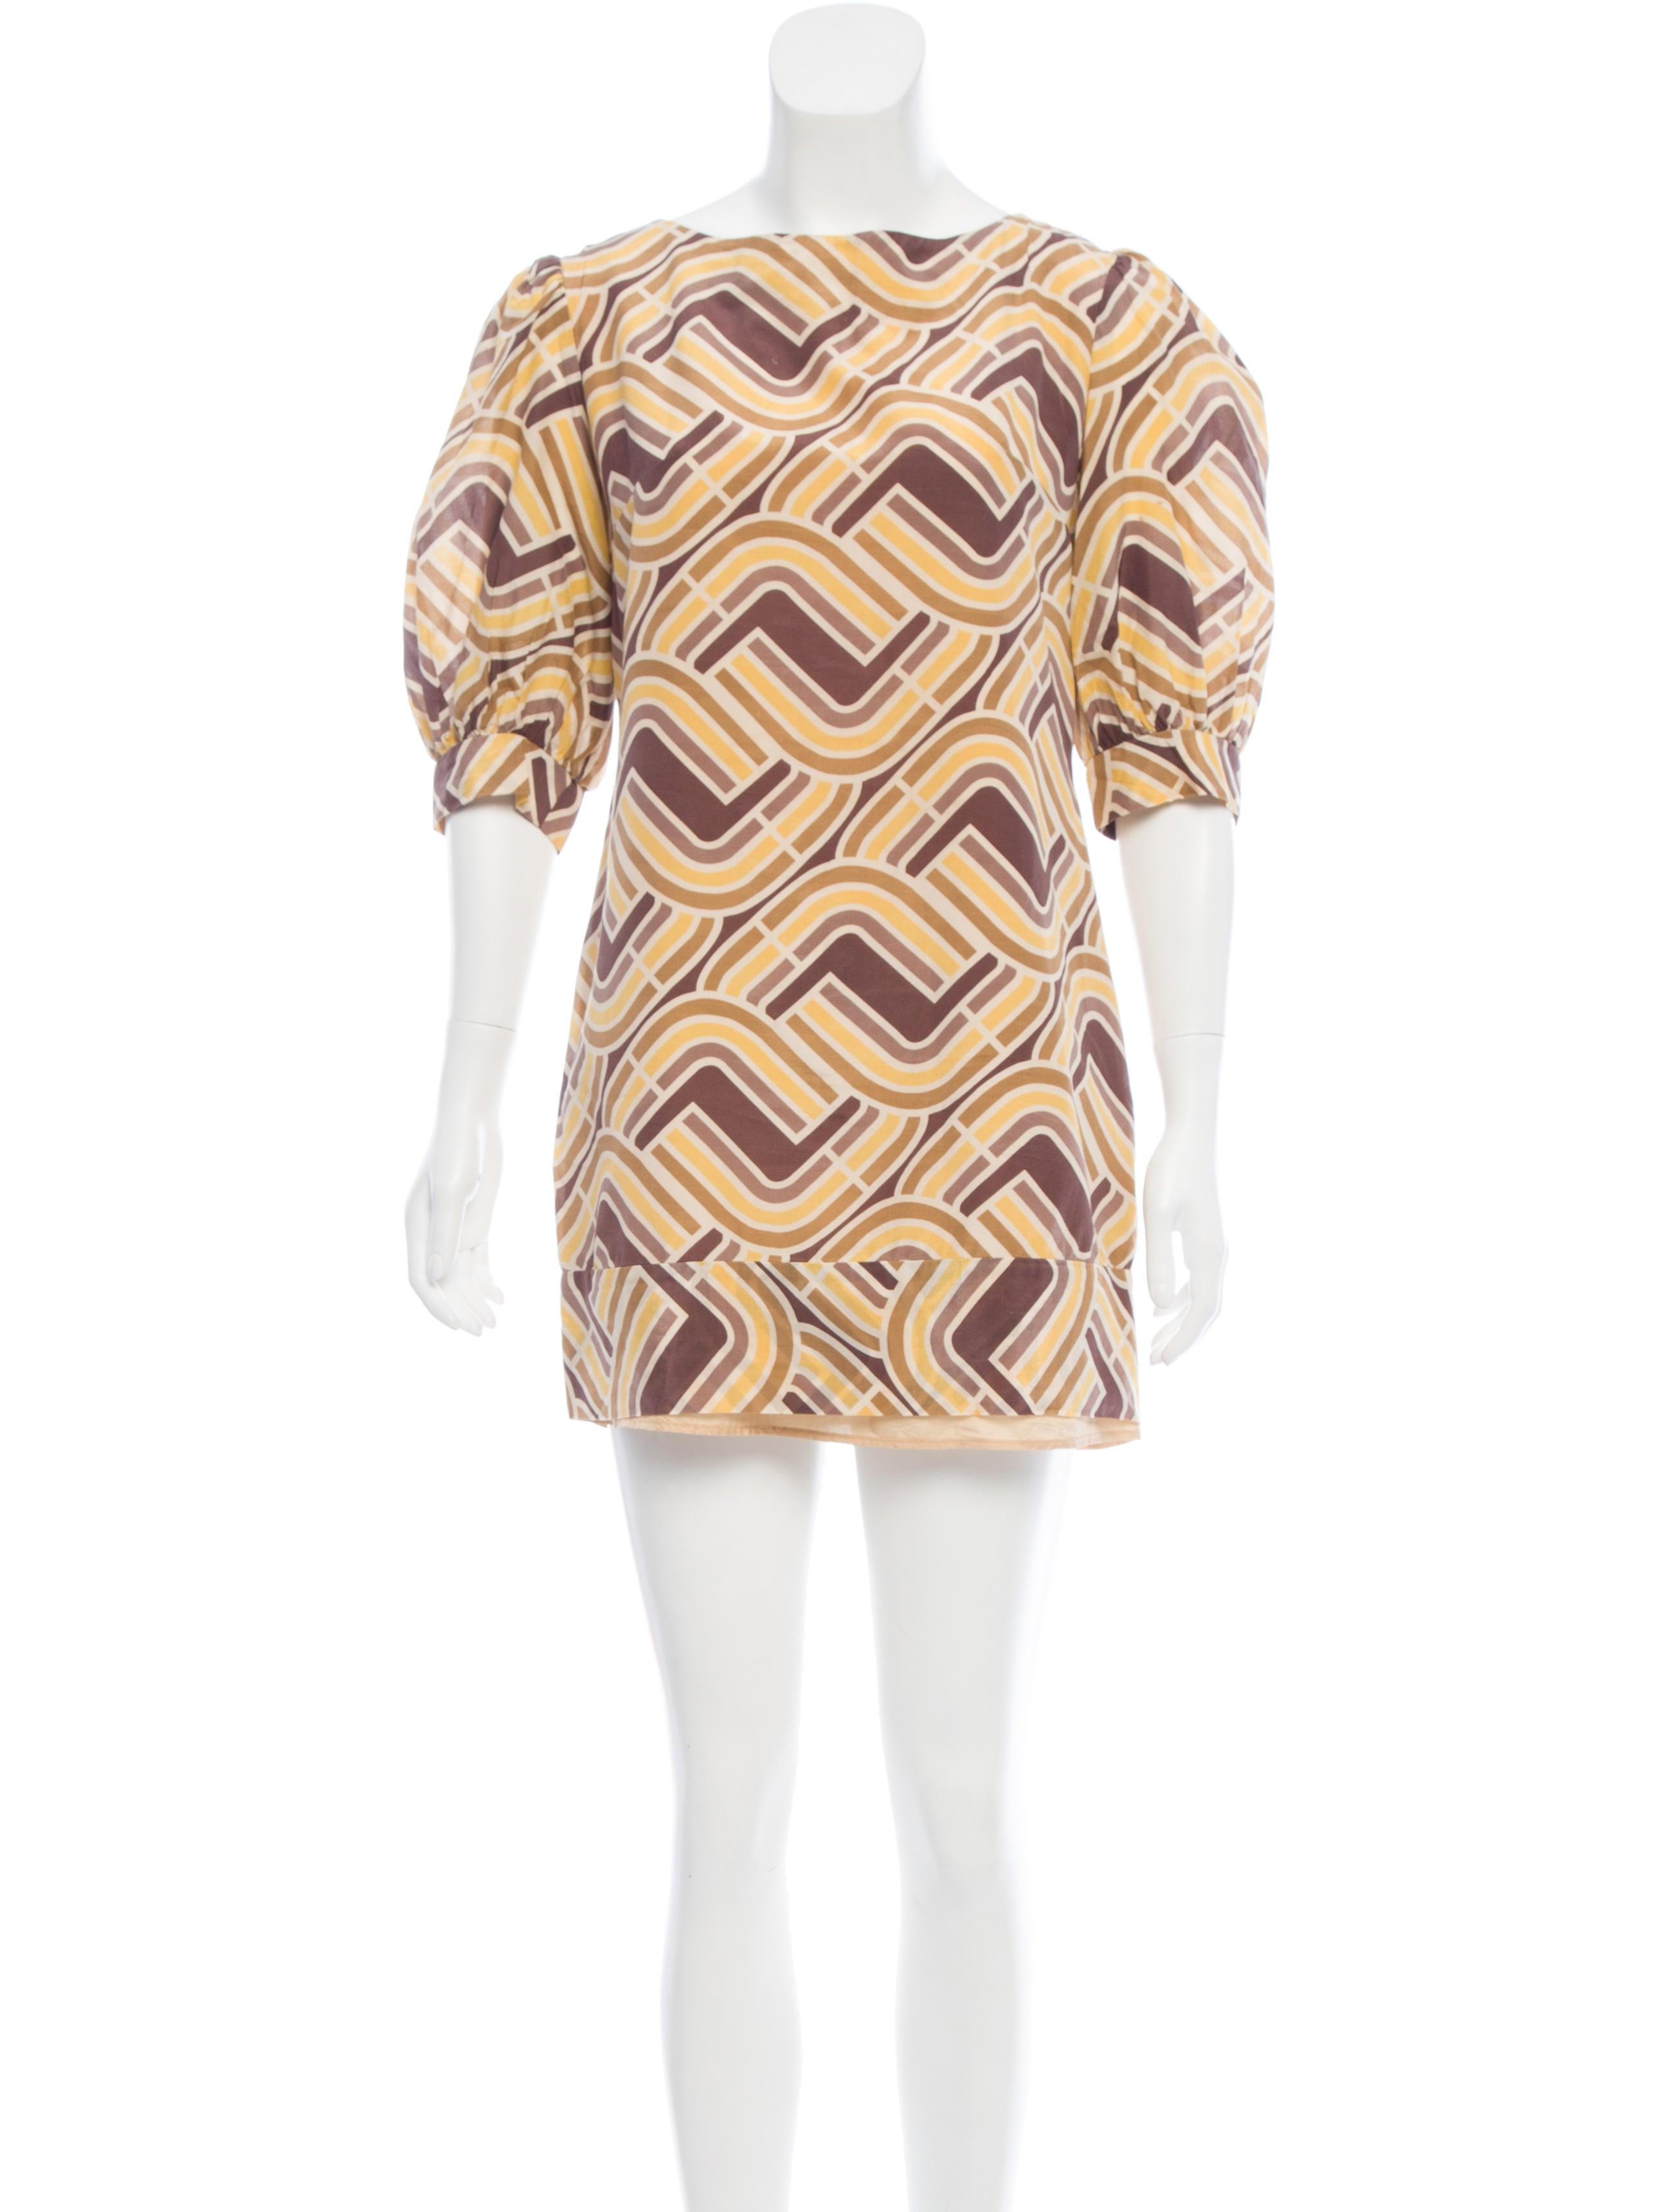 Amanda Uprichard Silk Mini Dress - Clothing - WAMUP20172 | The RealReal